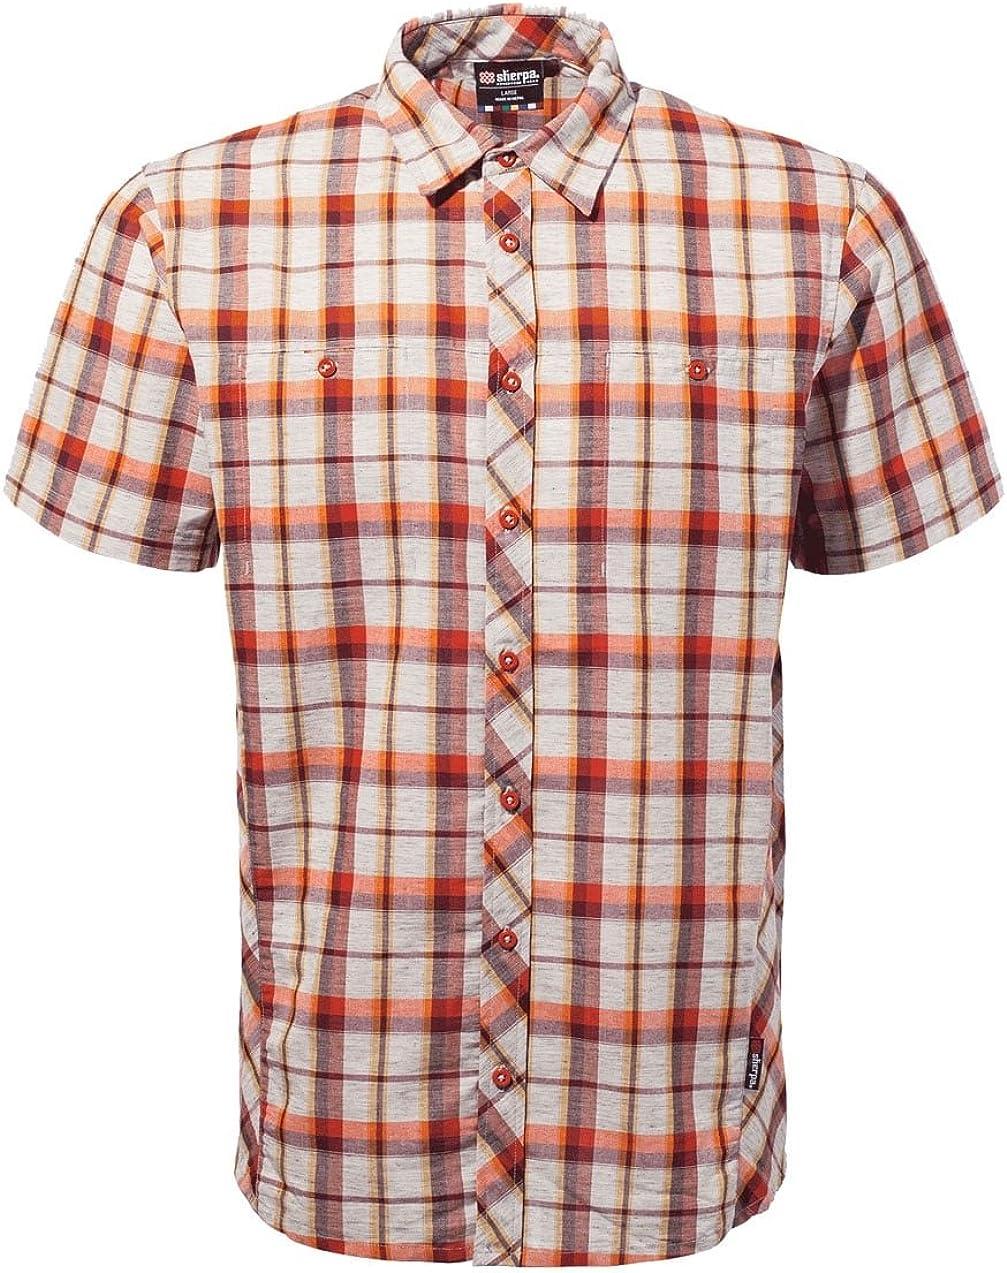 SHERPA ADVENTURE GEAR Mens Gandaki Shirt